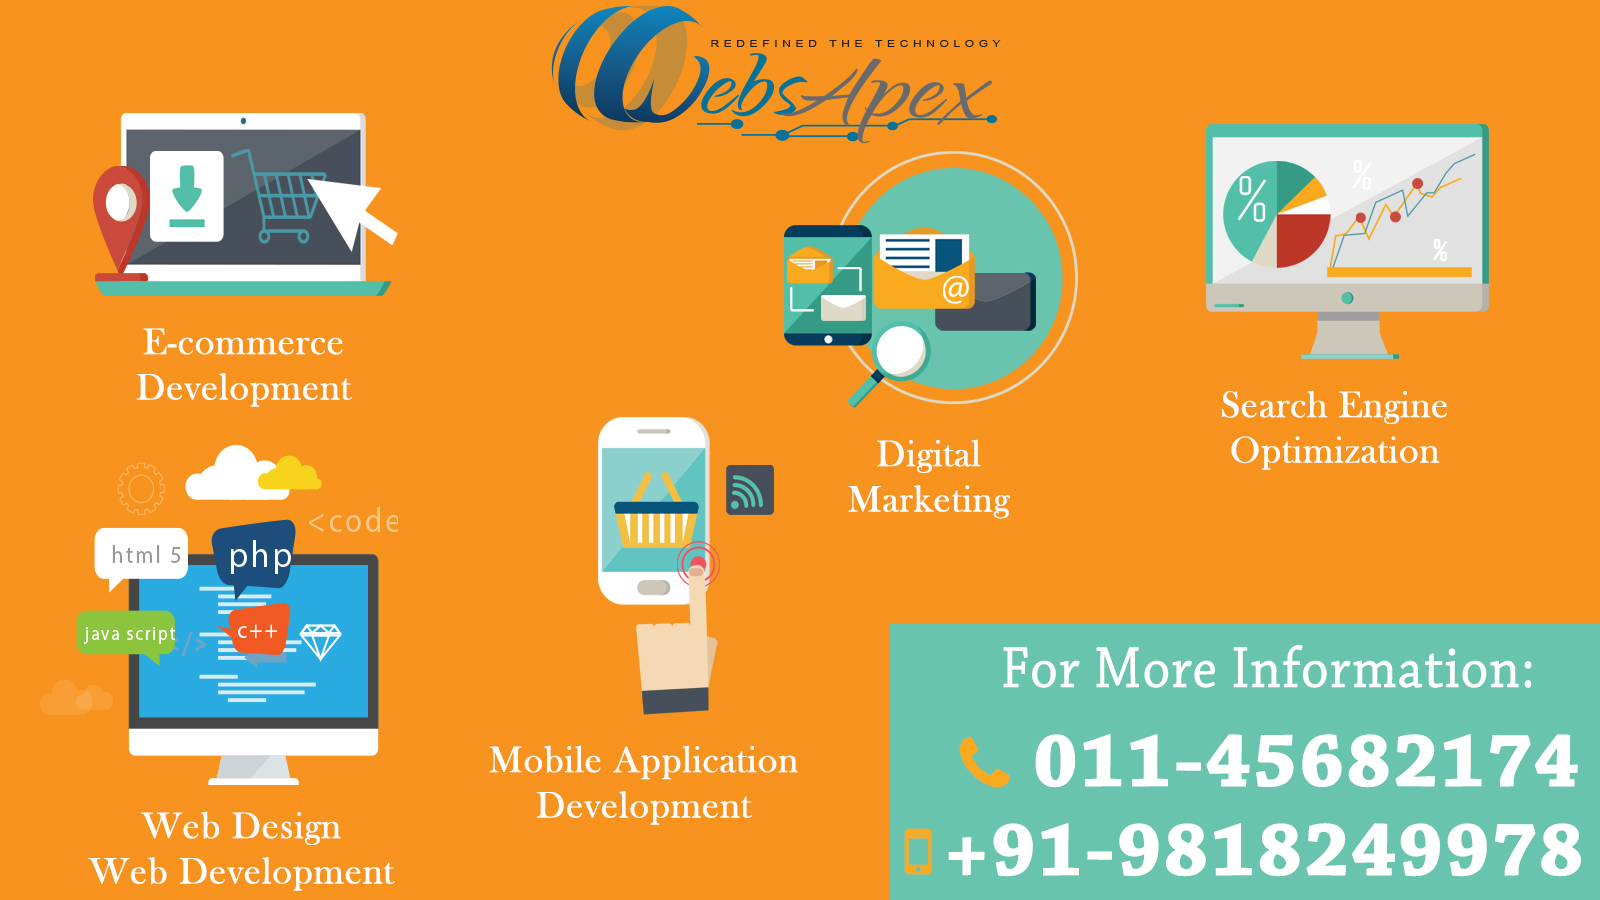 WebsApex   Ecommerce Web Design and Web Development Company